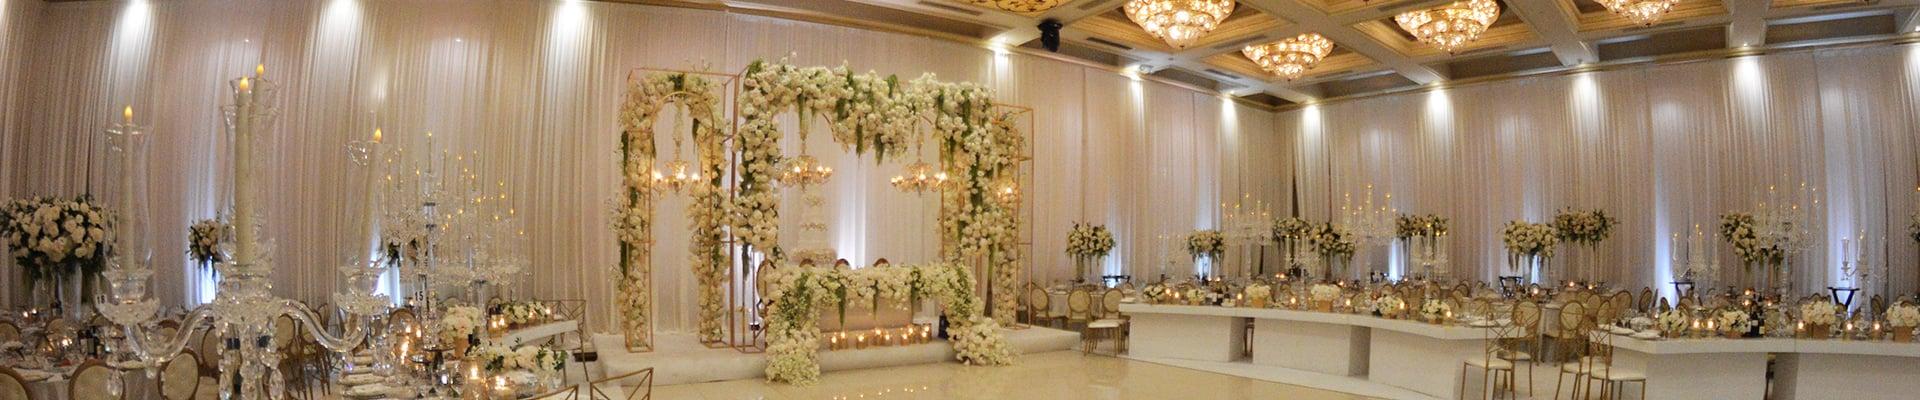 Metropol Banquet Hall - Grand Ballroom